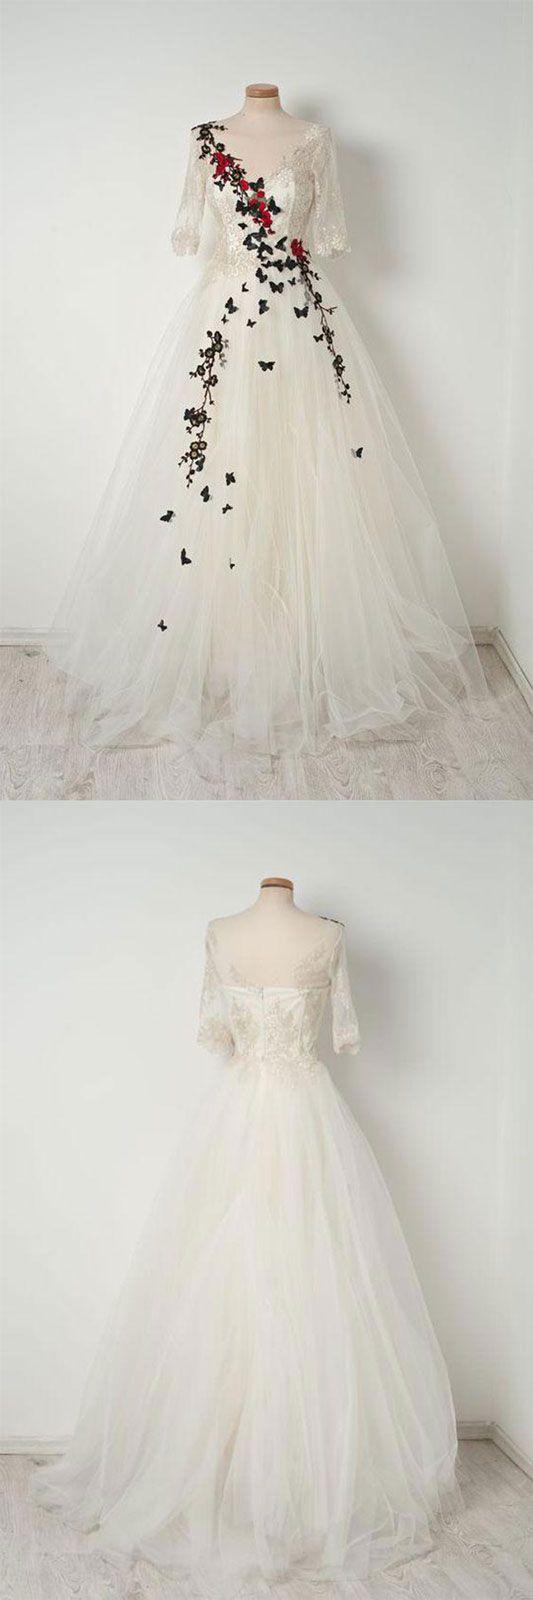 76 Best Islamic Wedding Idea Images Muslim Brides Wedding